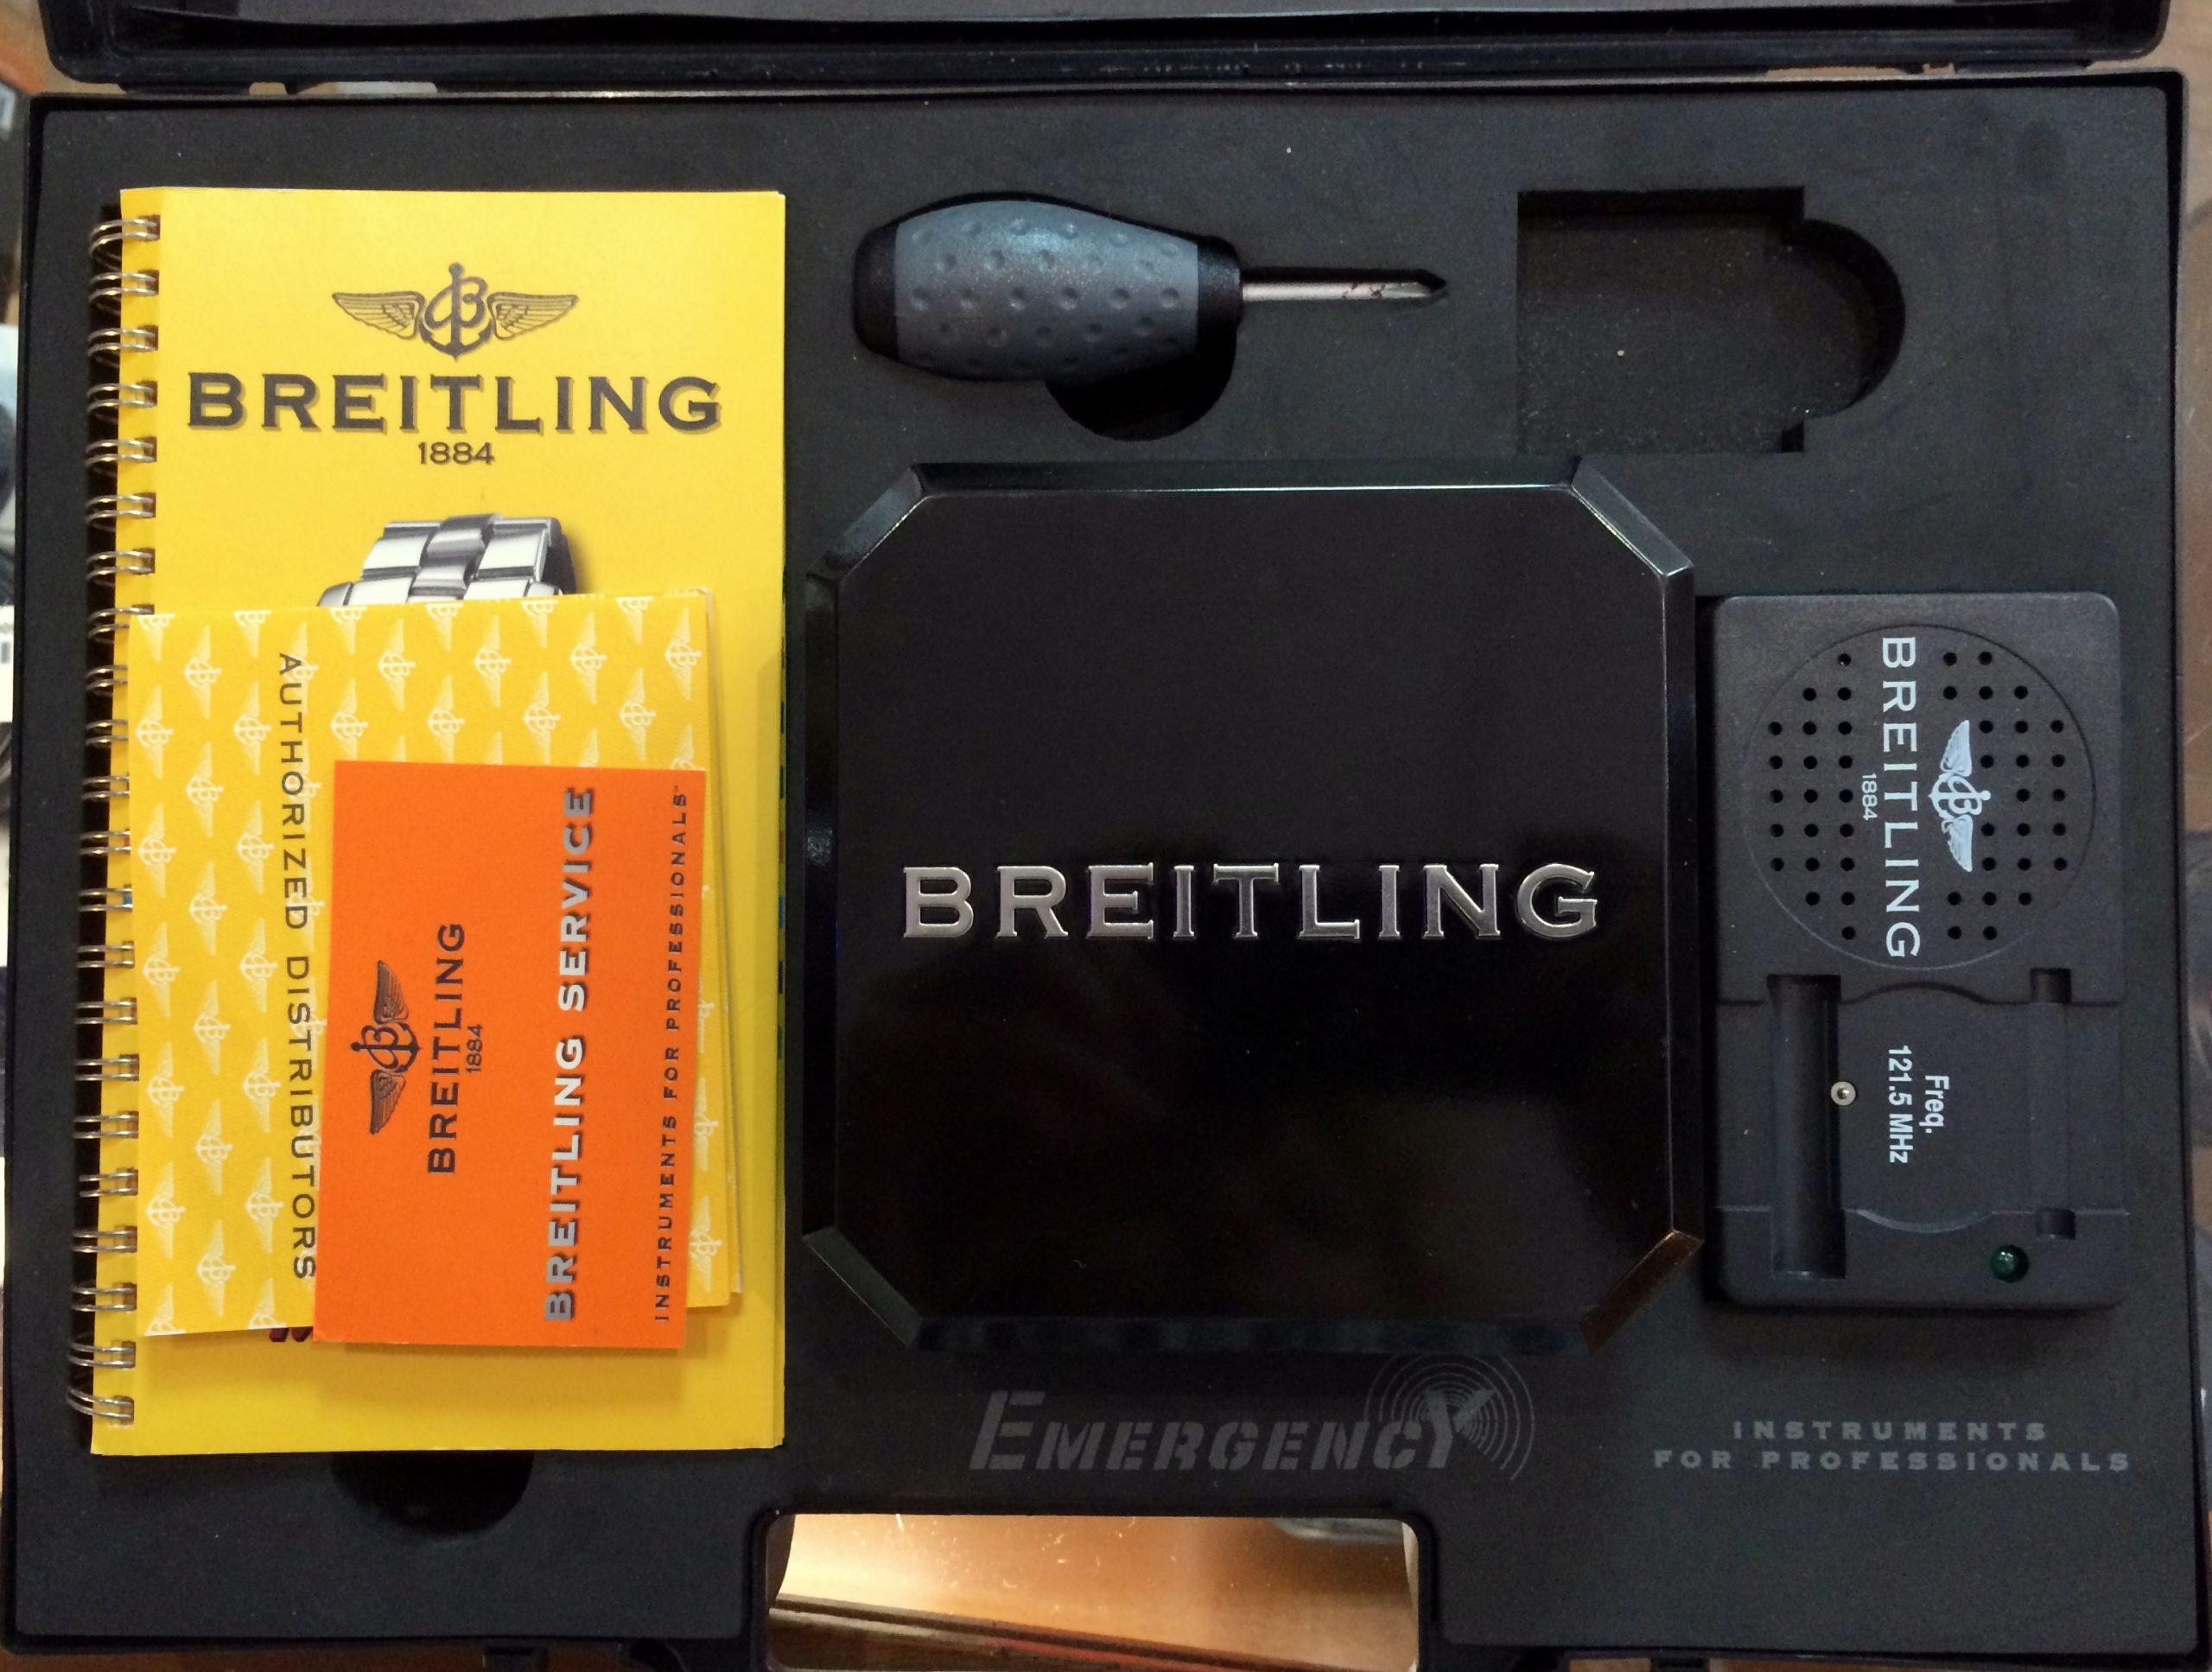 Breitling (8)